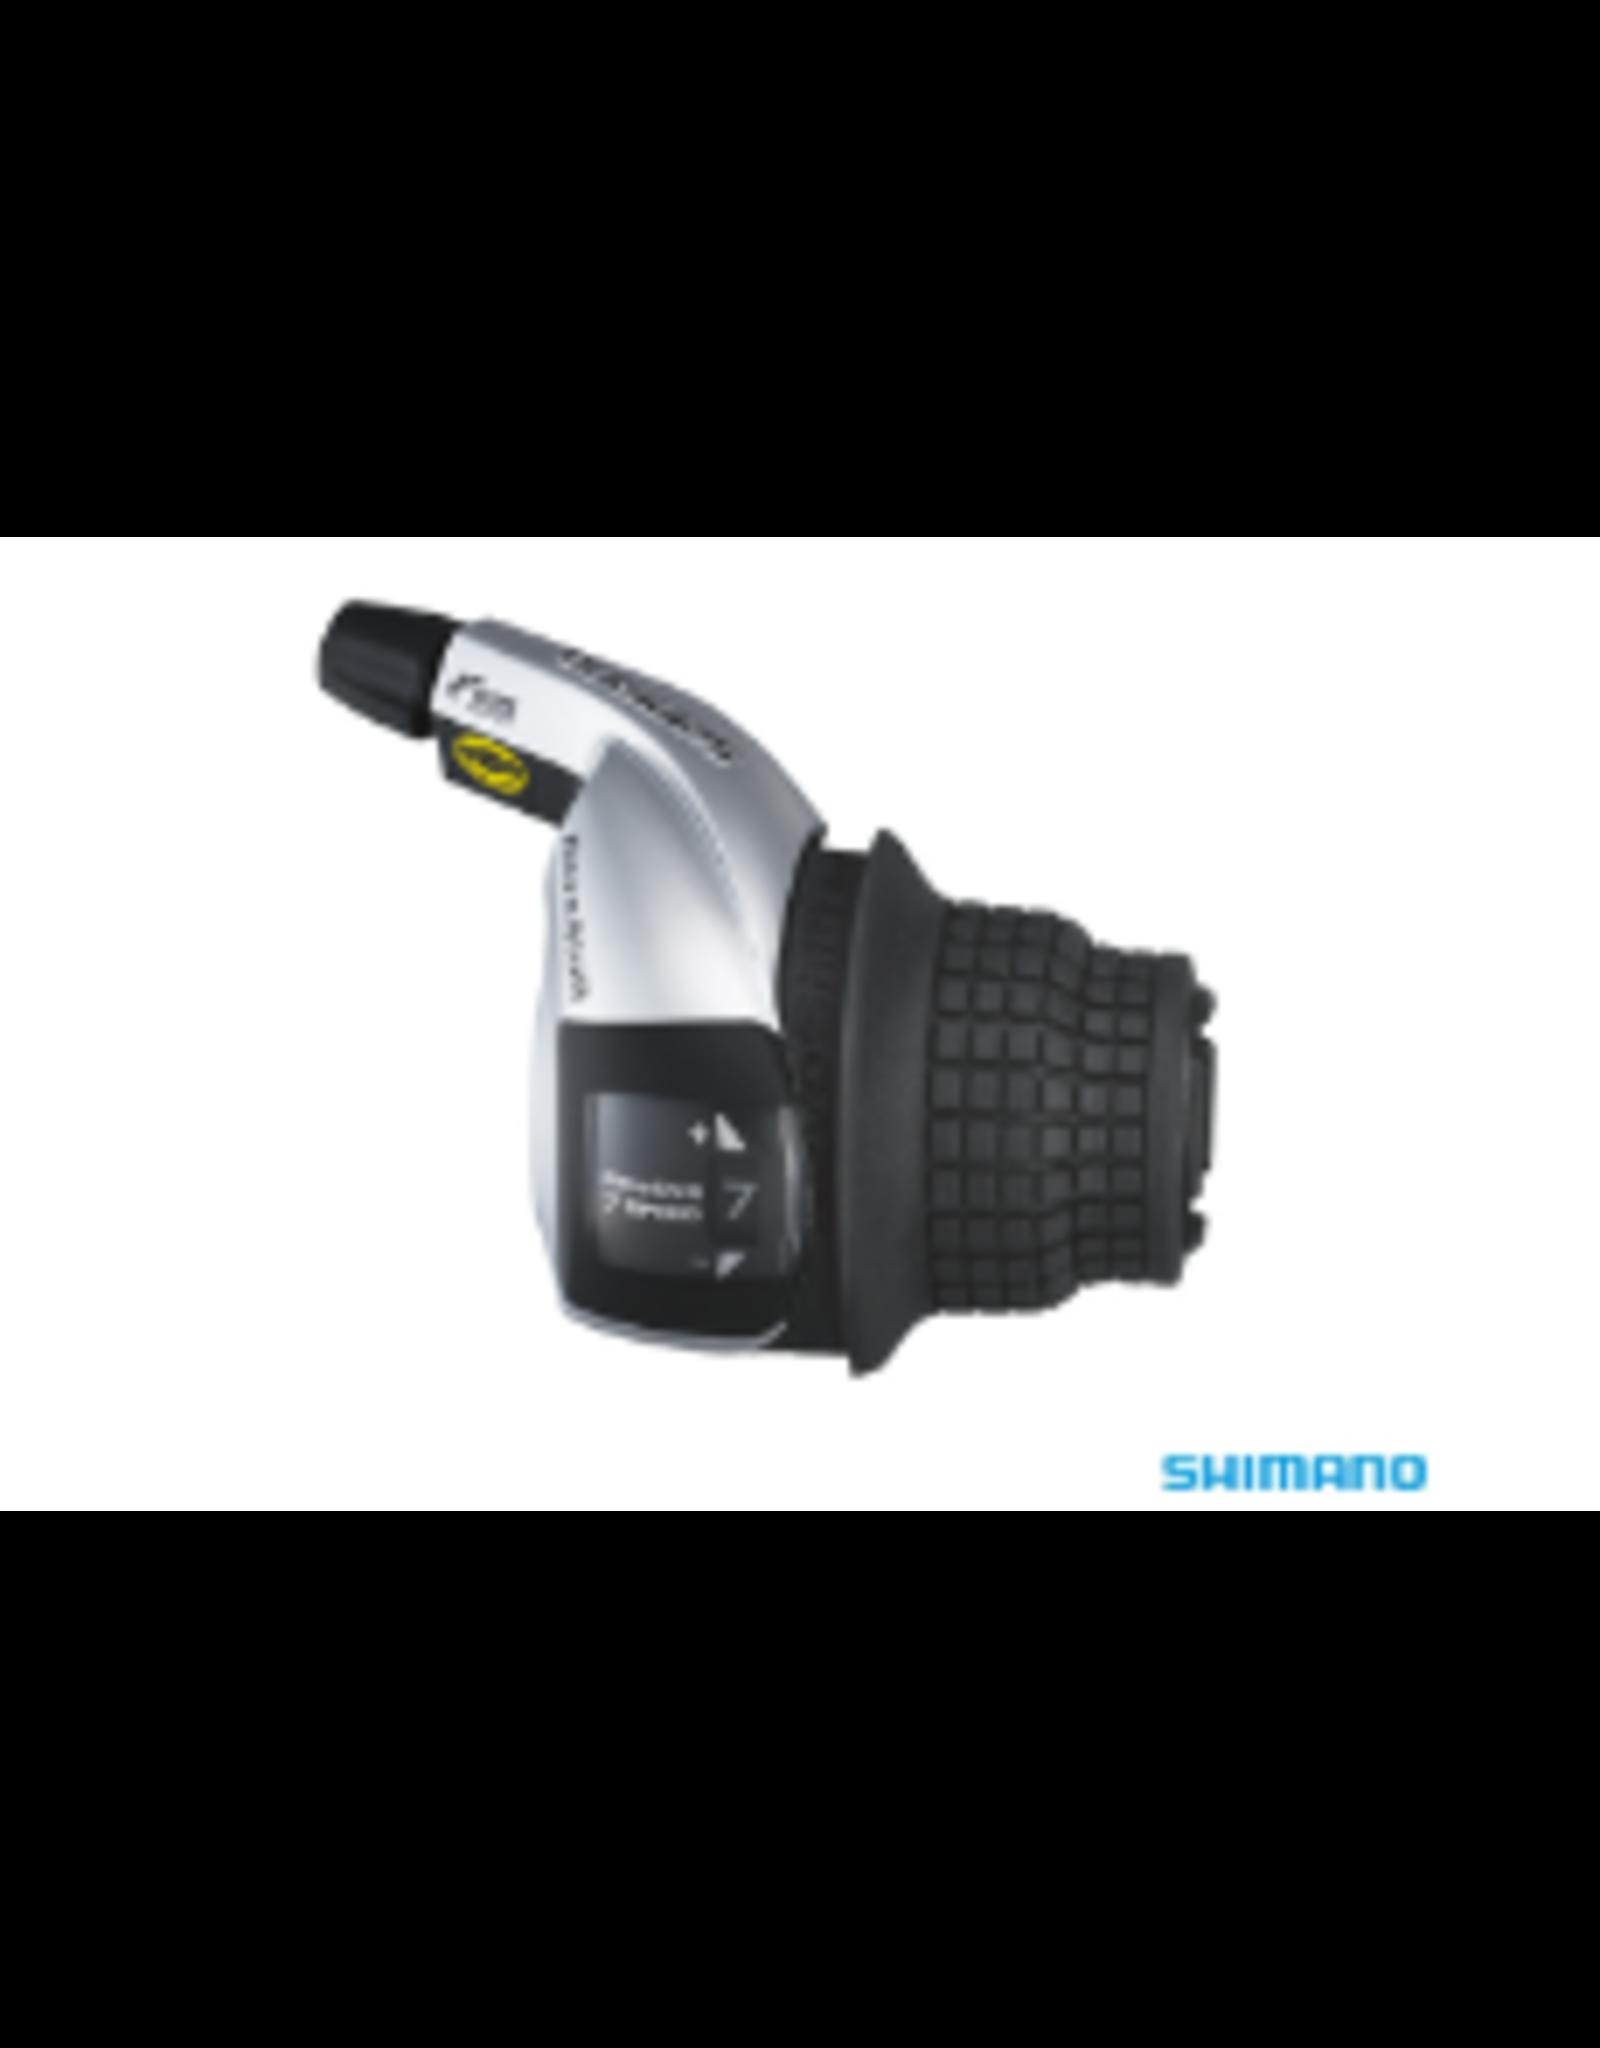 Shimano SHIFTER SET SHIMANO REVO SL-RS45 RIGHT 6 SPEED/LEFT SIS